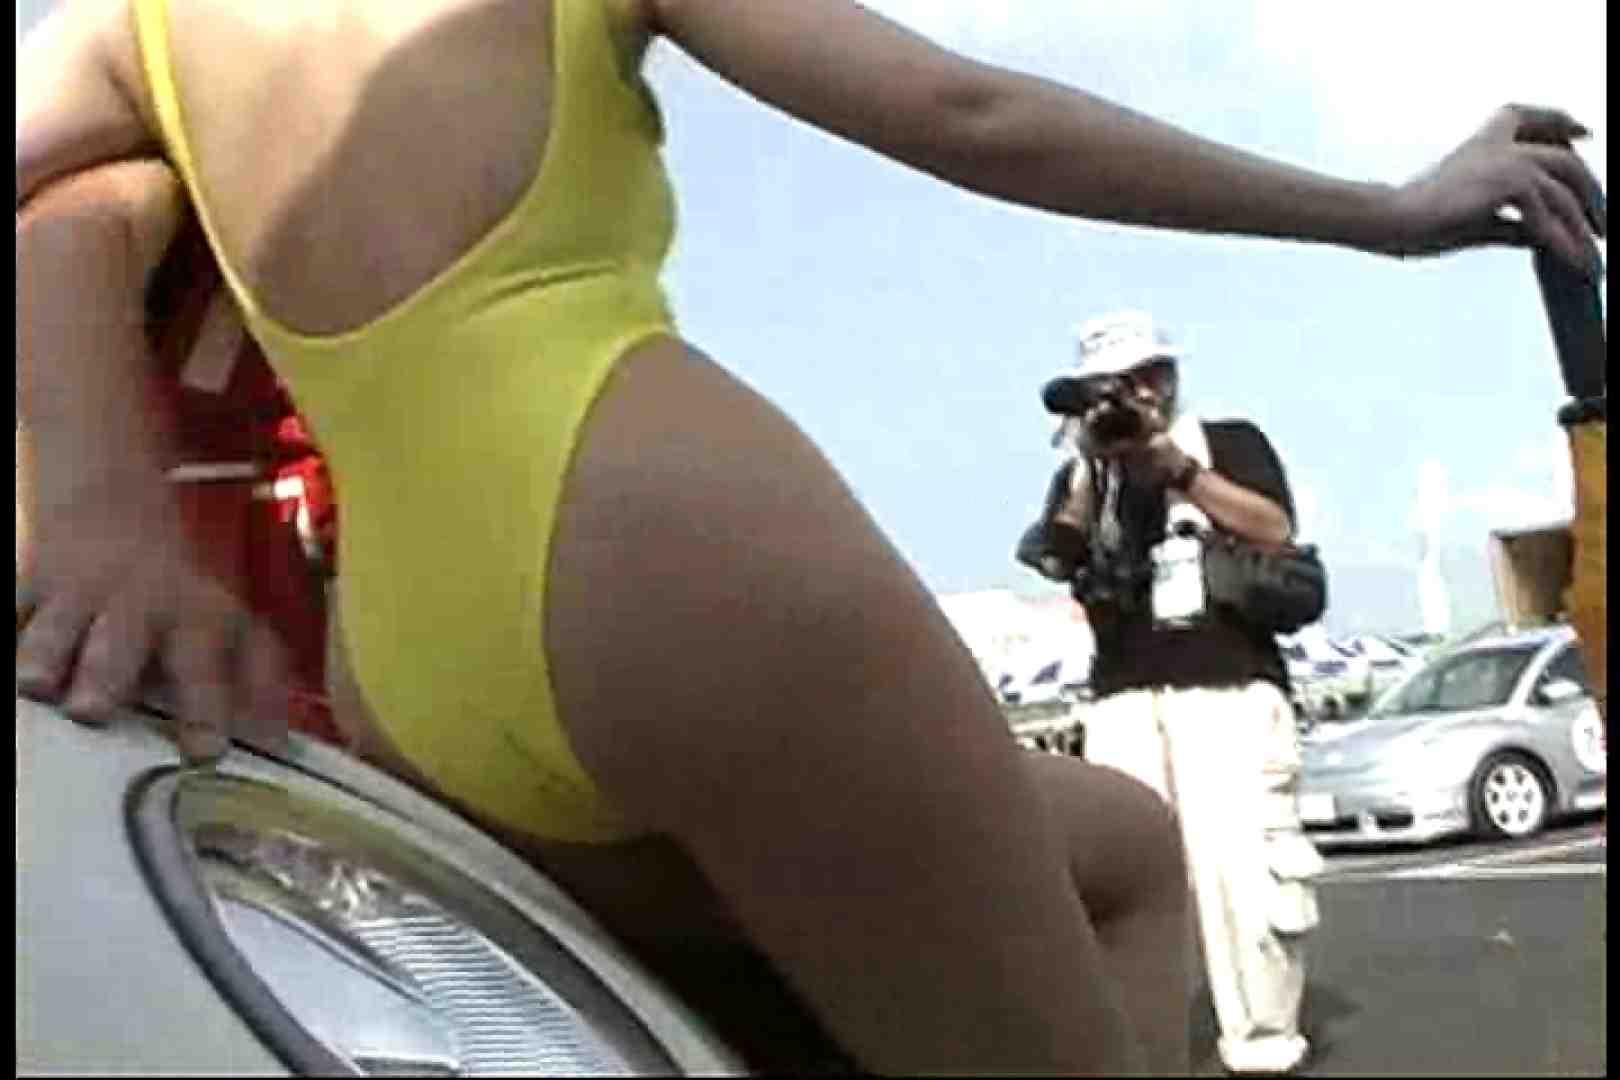 RQカメラ地獄Vol.6 レースクイーン | OL女体  54連発 49